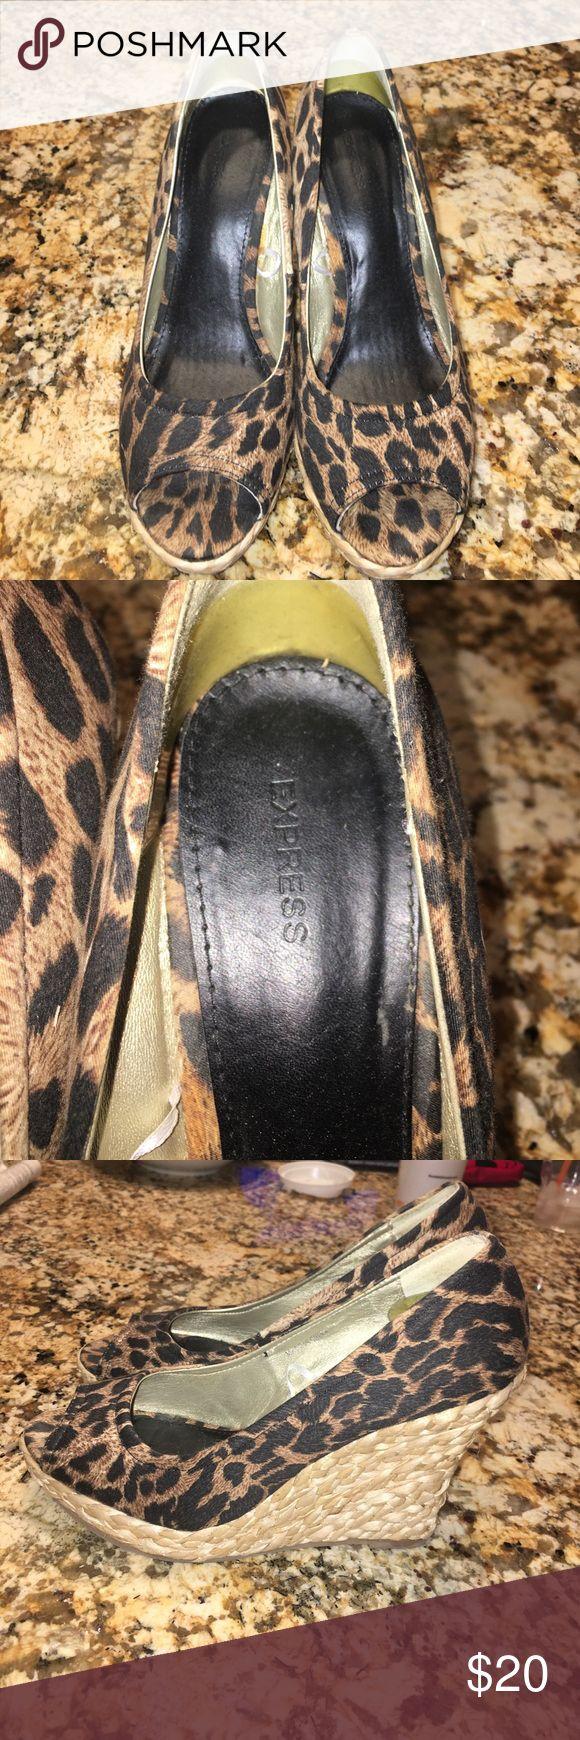 Express Leopard Espadrilles Sz 8 Express Leopard Espadrilles Sz 8 Express Shoes Espadrilles